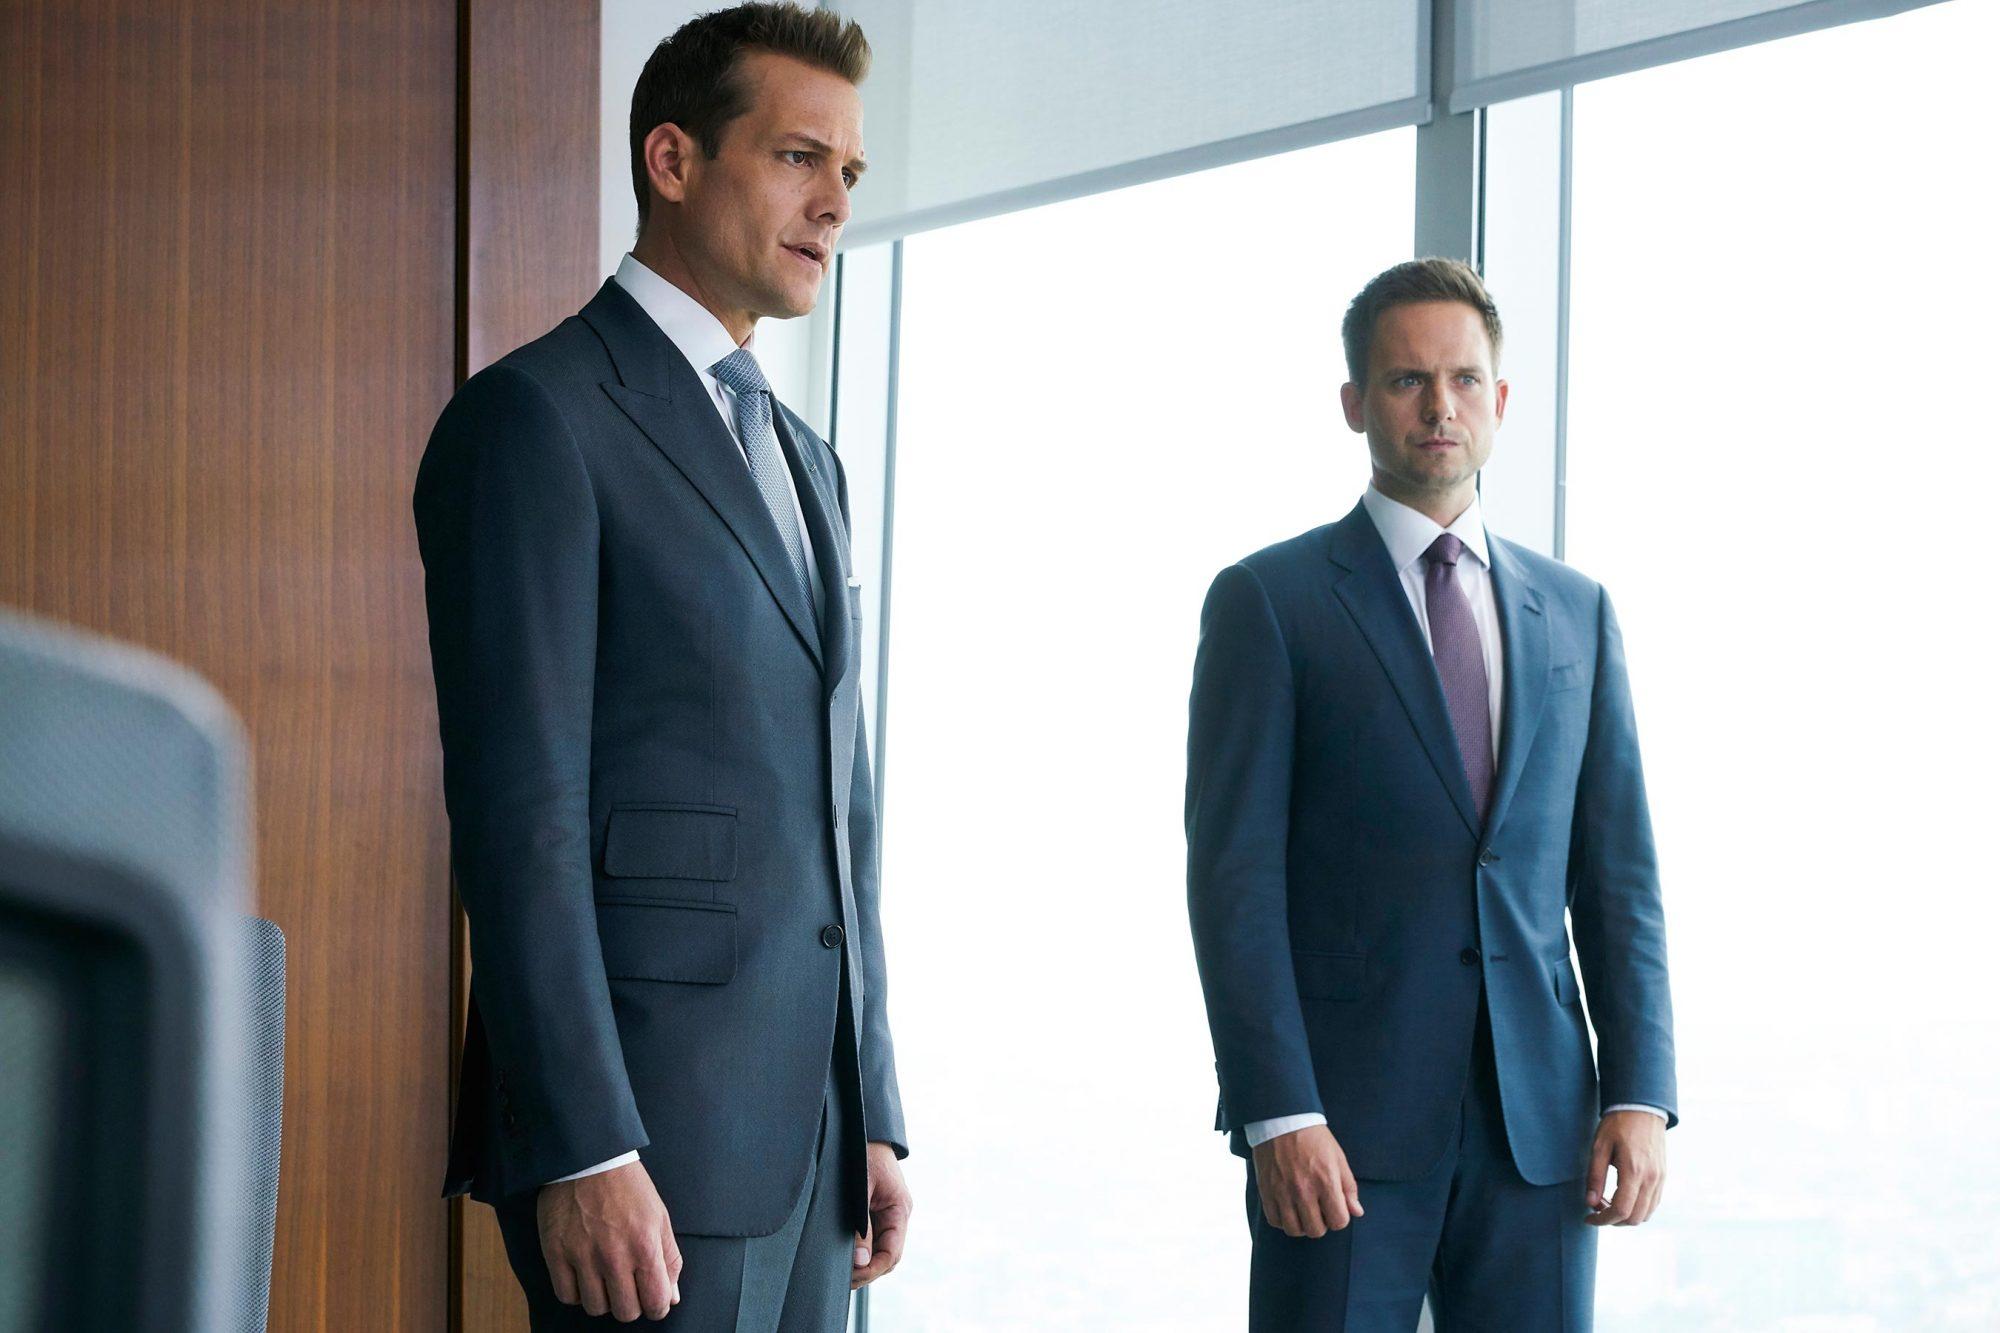 suits recap season 7 episode 13 ew com suits recap season 7 episode 13 ew com